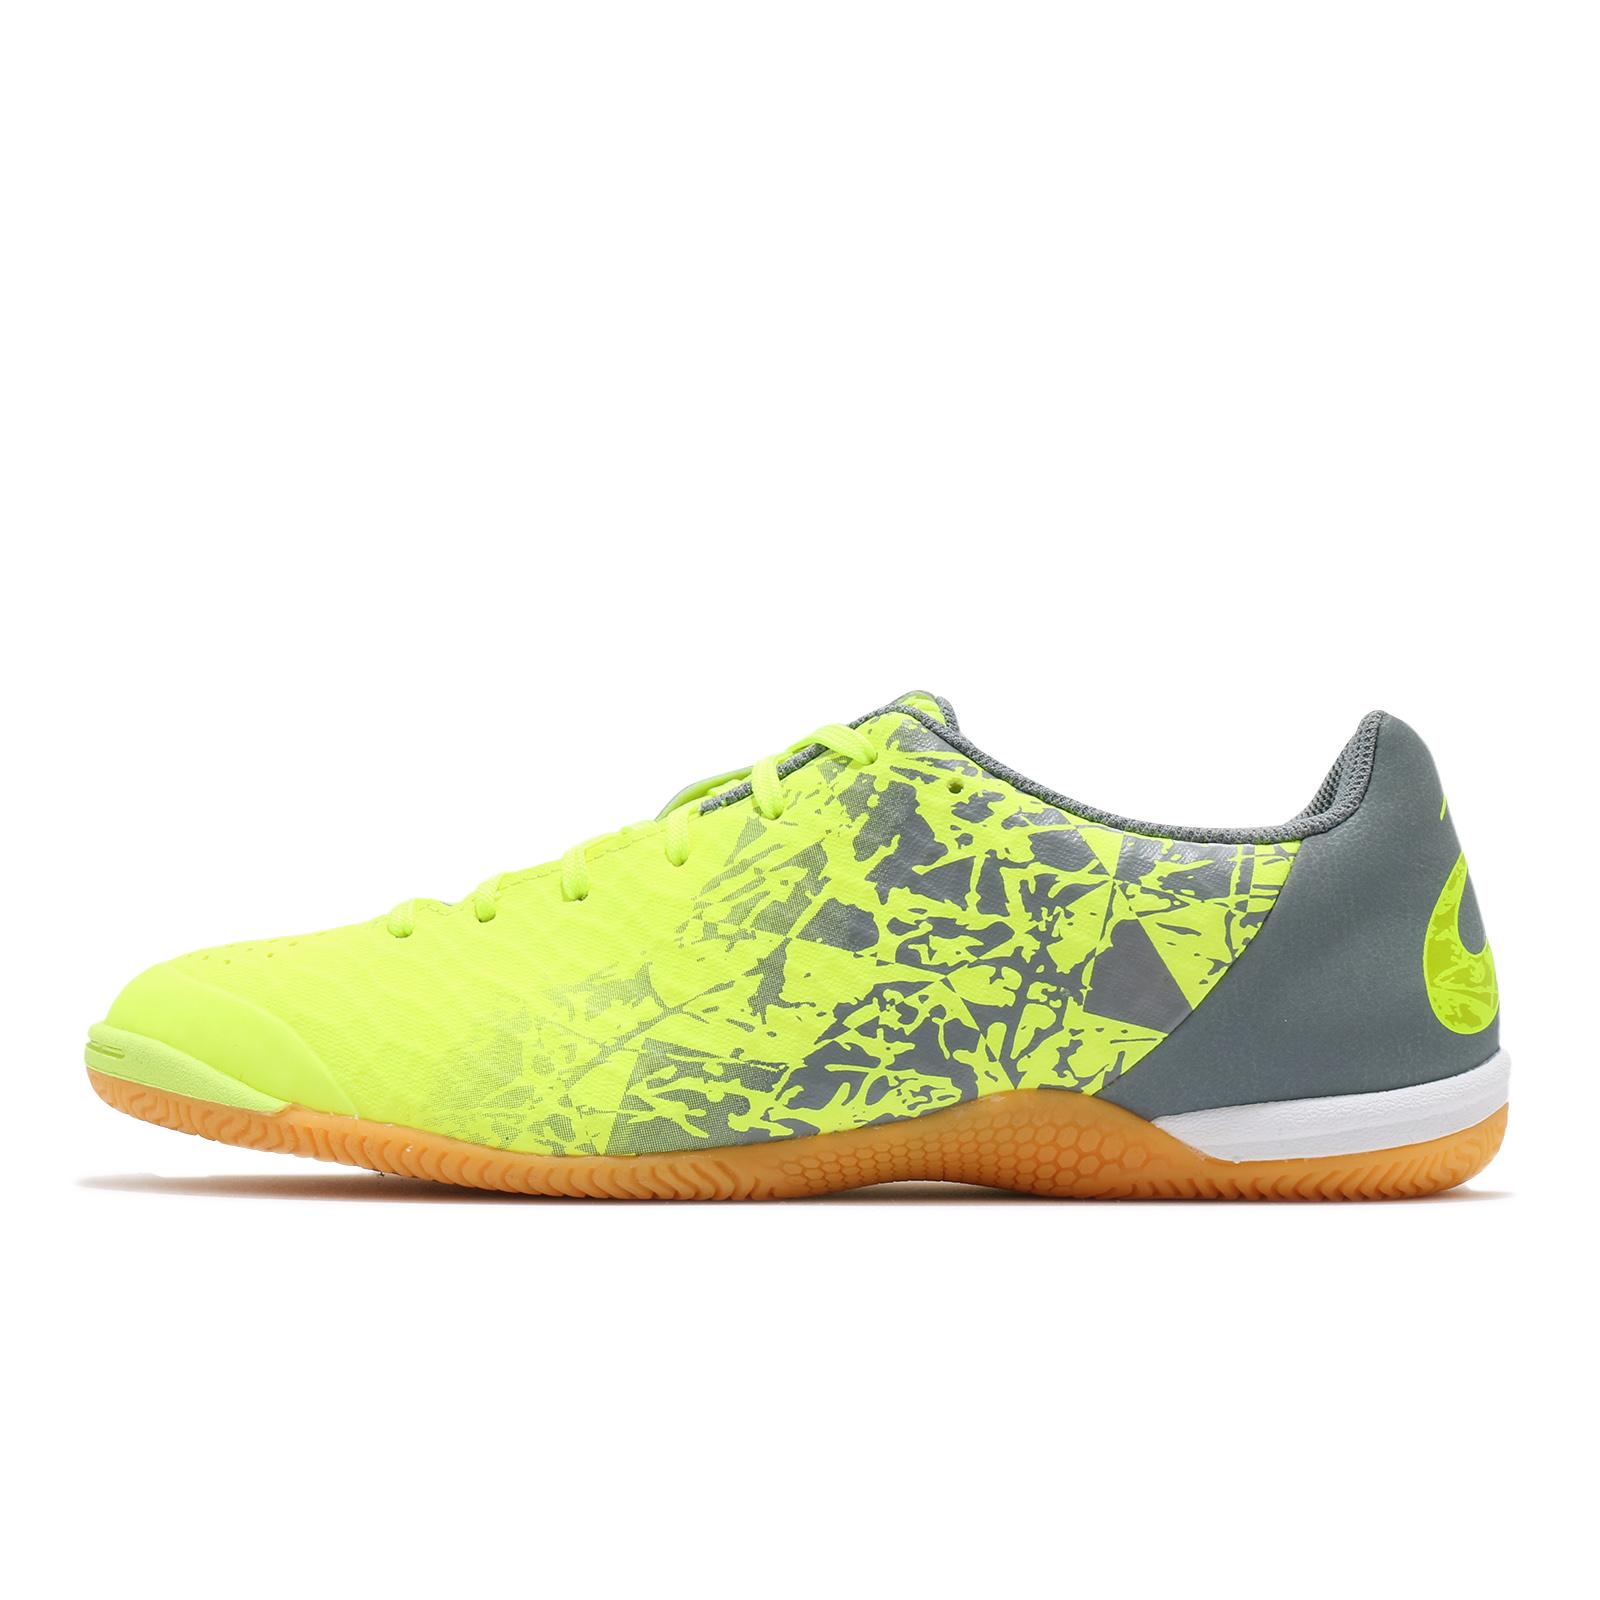 Asics 桌球鞋 Hypersurv 男鞋 灰 黃 膠底 室內運動鞋 亞瑟士 【ACS】 1073A009-750